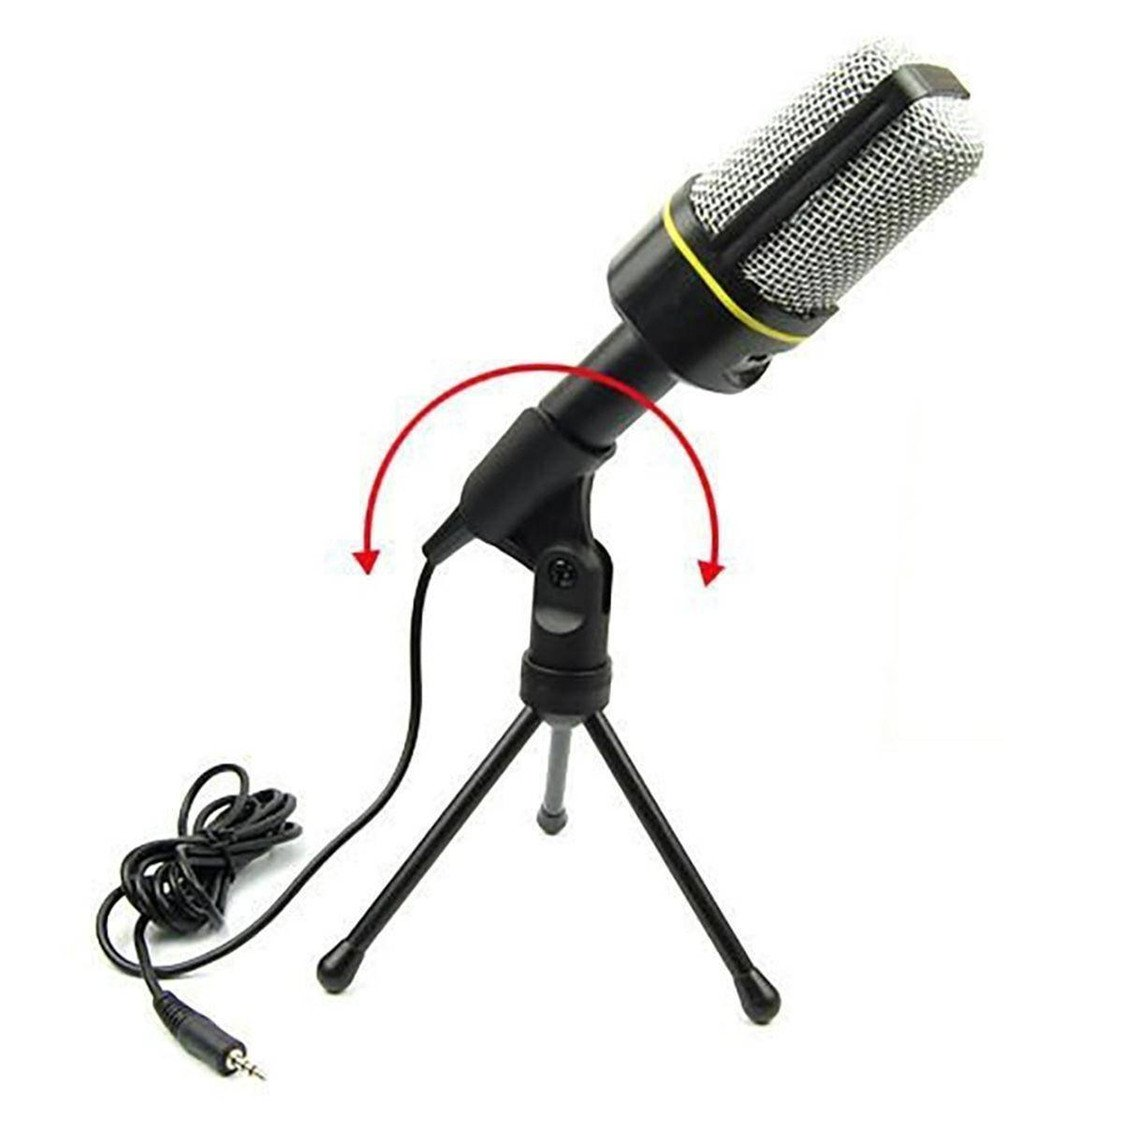 Buy JEE-Accessories 3 5mm Professional Condenser Sound